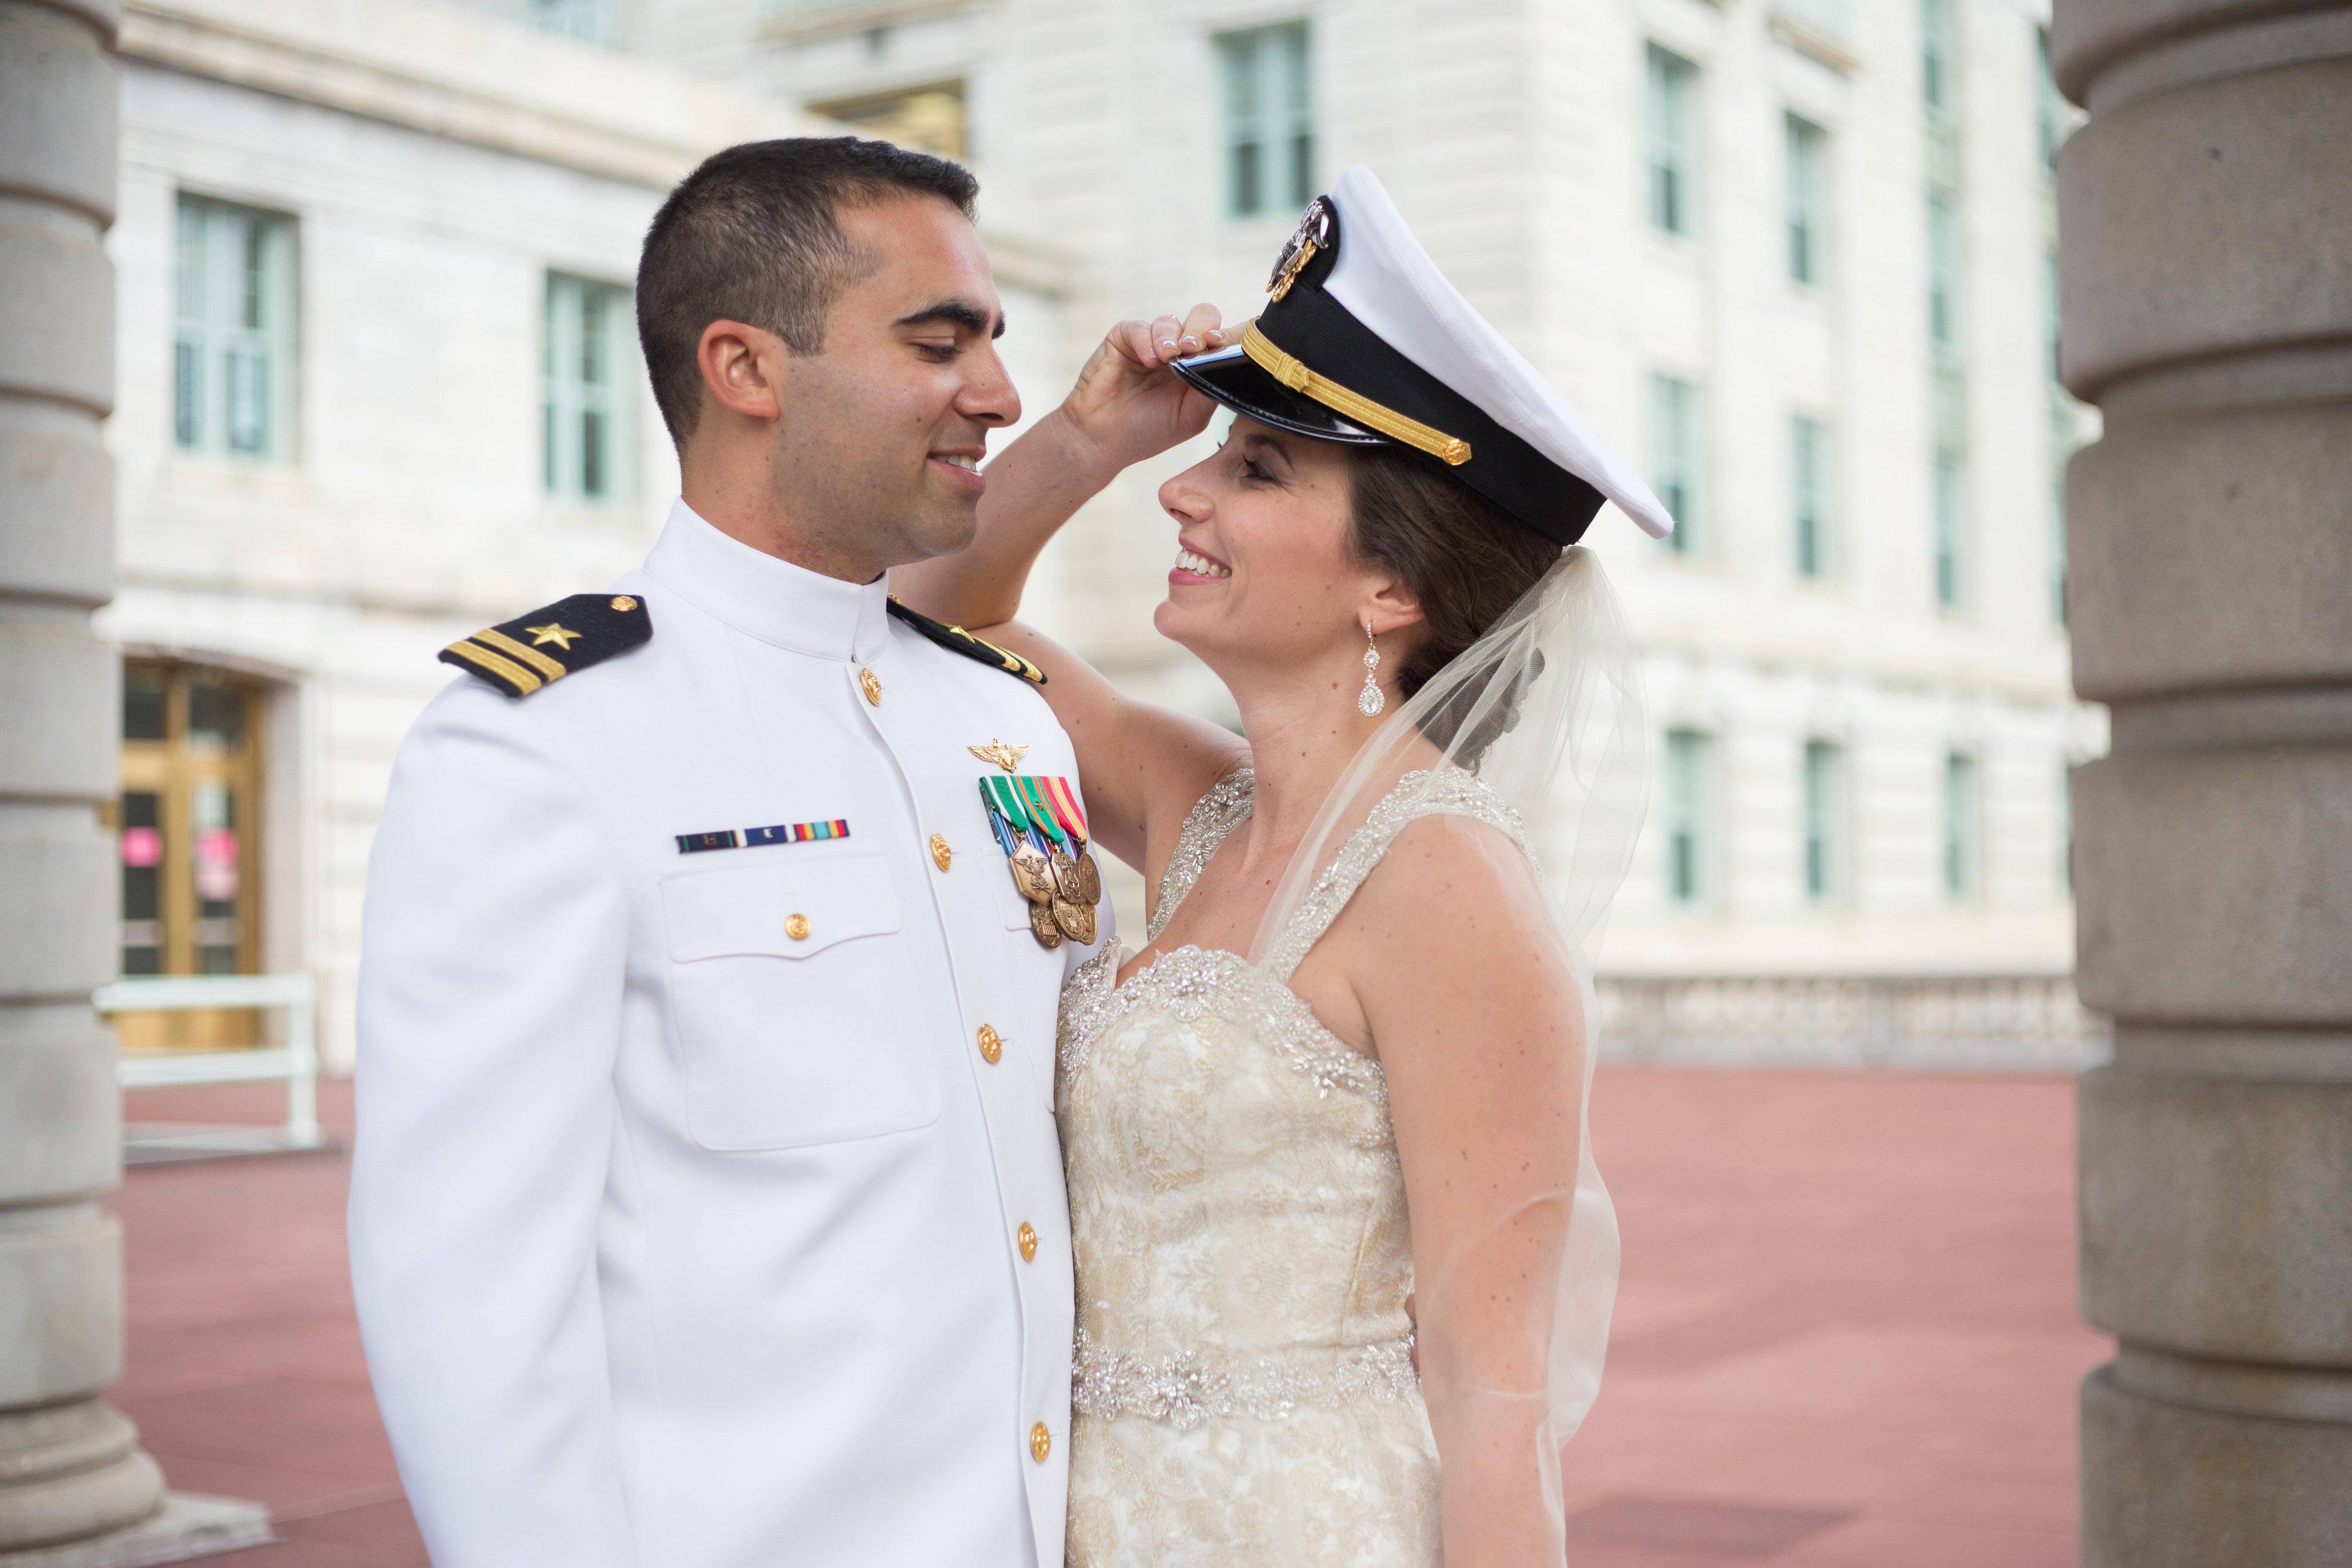 USNA bride with uniform cover